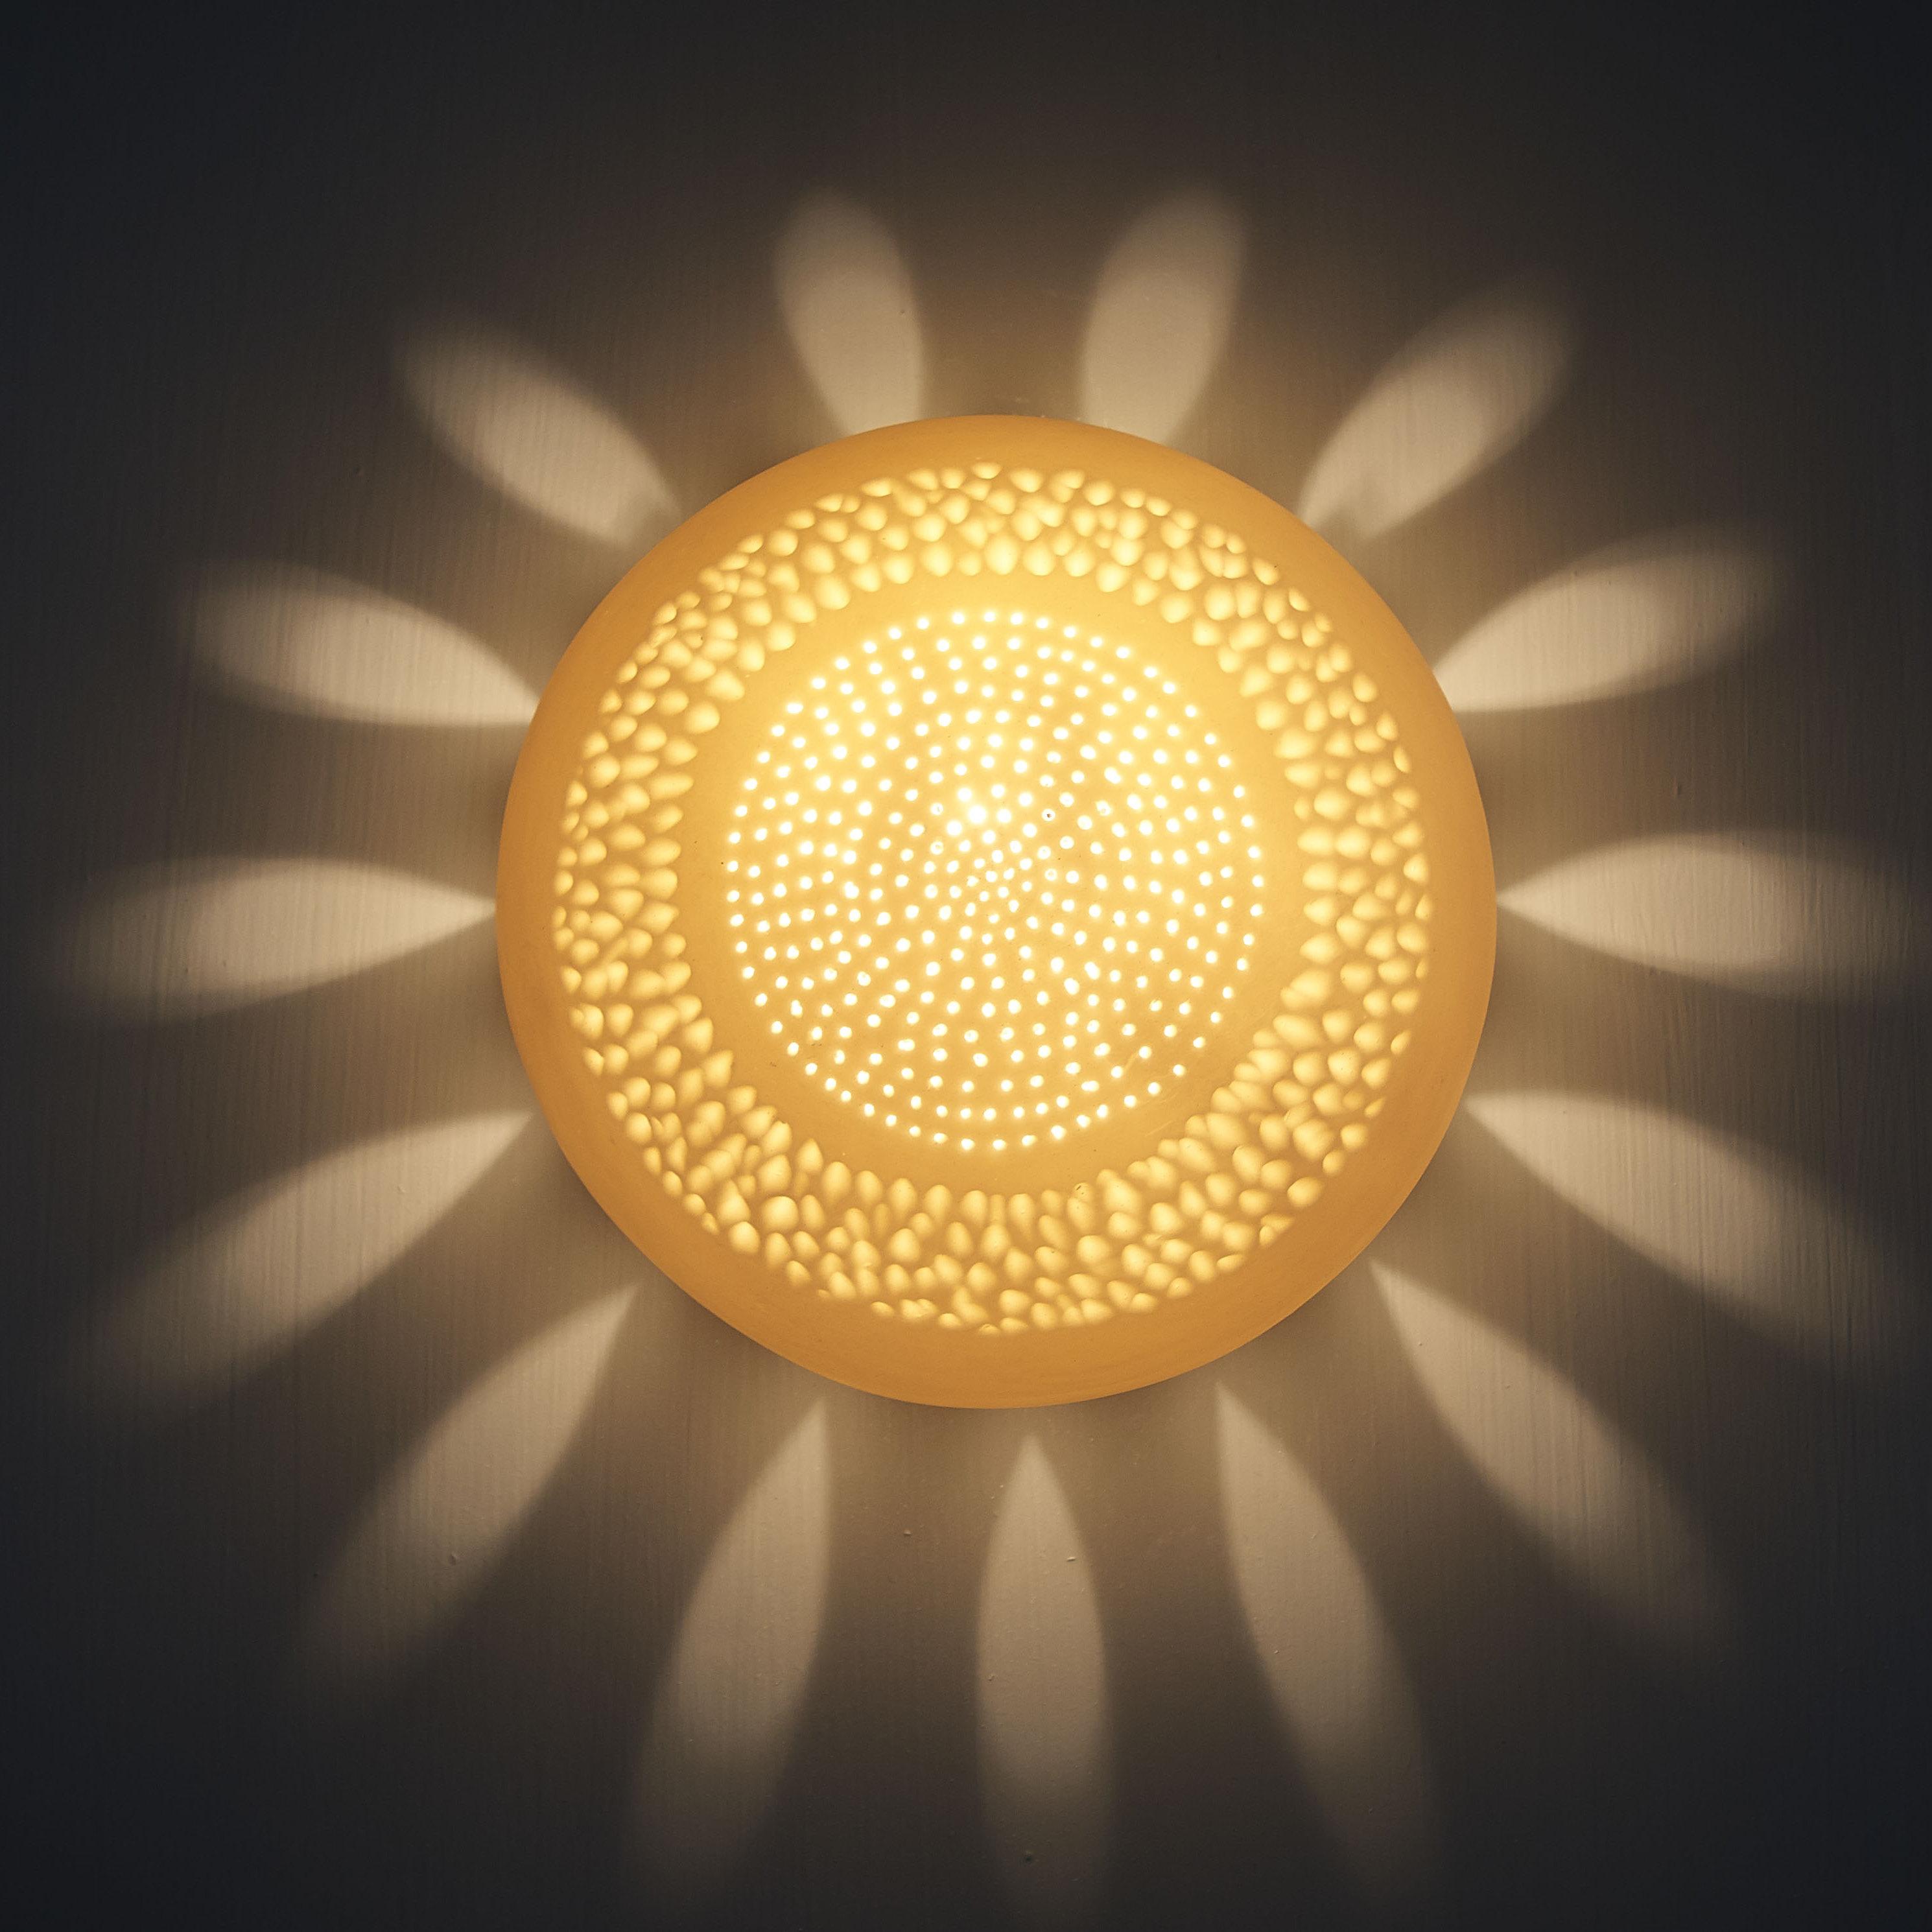 Sconce. Wall light fixture. Living room light. Wall mount | Etsy